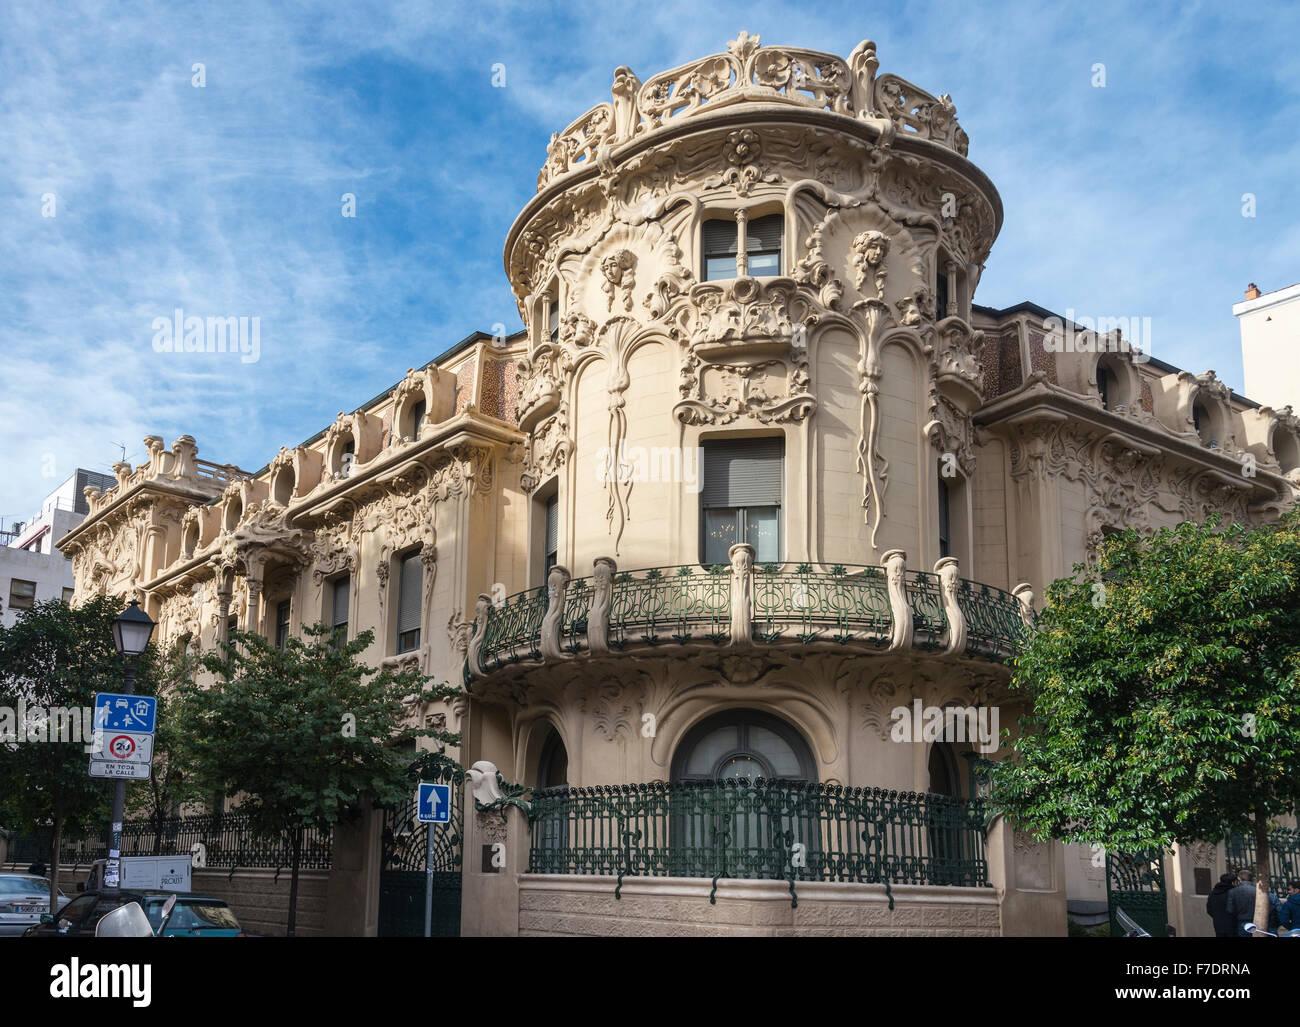 The Art Nouveau Palacio Longora, architect Jose Grases Riera, built 1902-4, Calle de Fernando VI, Alonso Martinez, Stock Photo